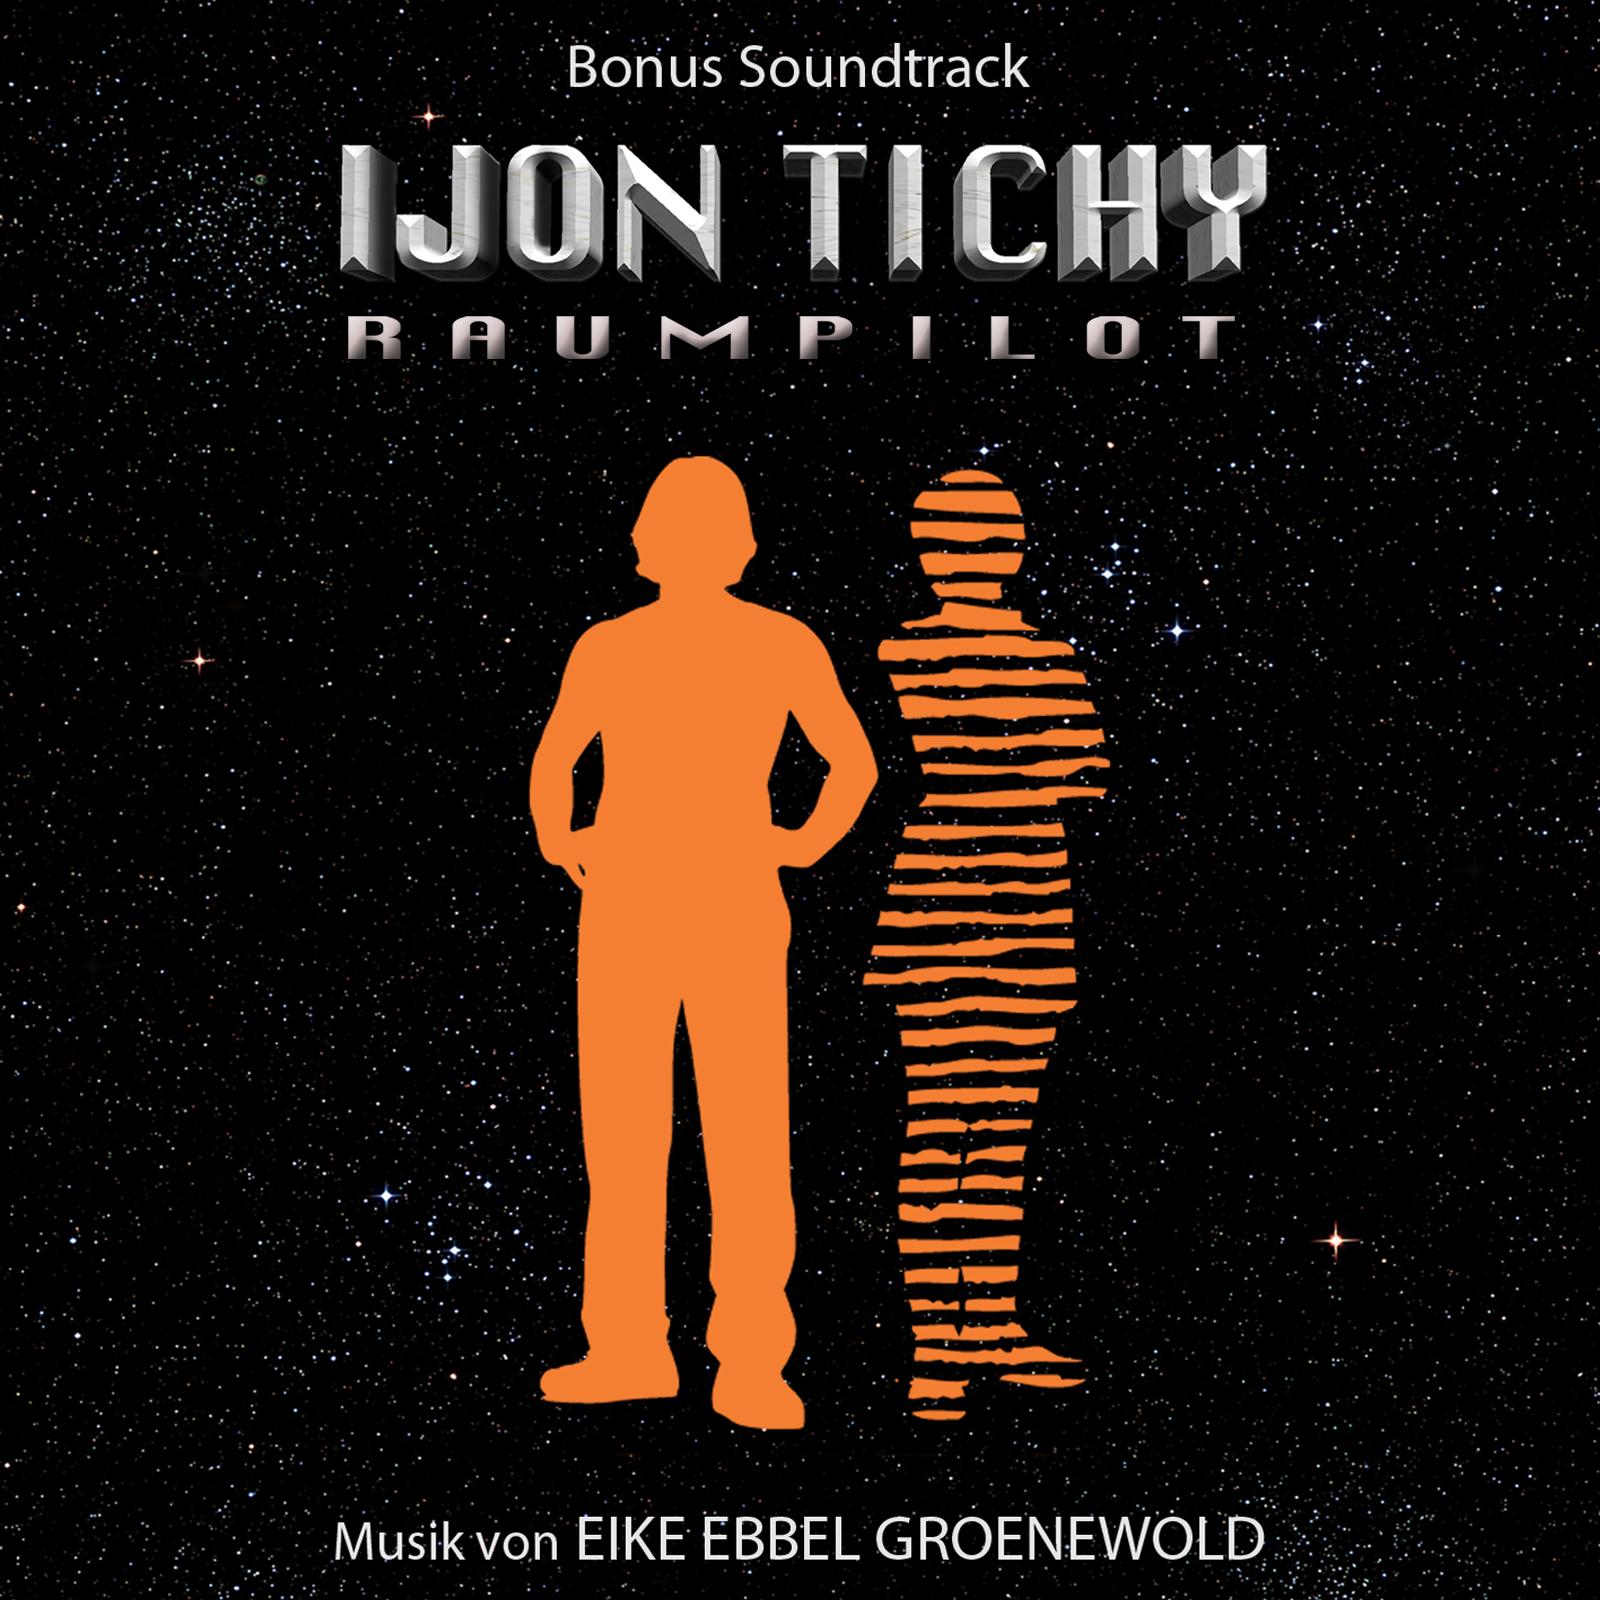 Ijon Tichy: Raumpilot – Bonus Soundtrack